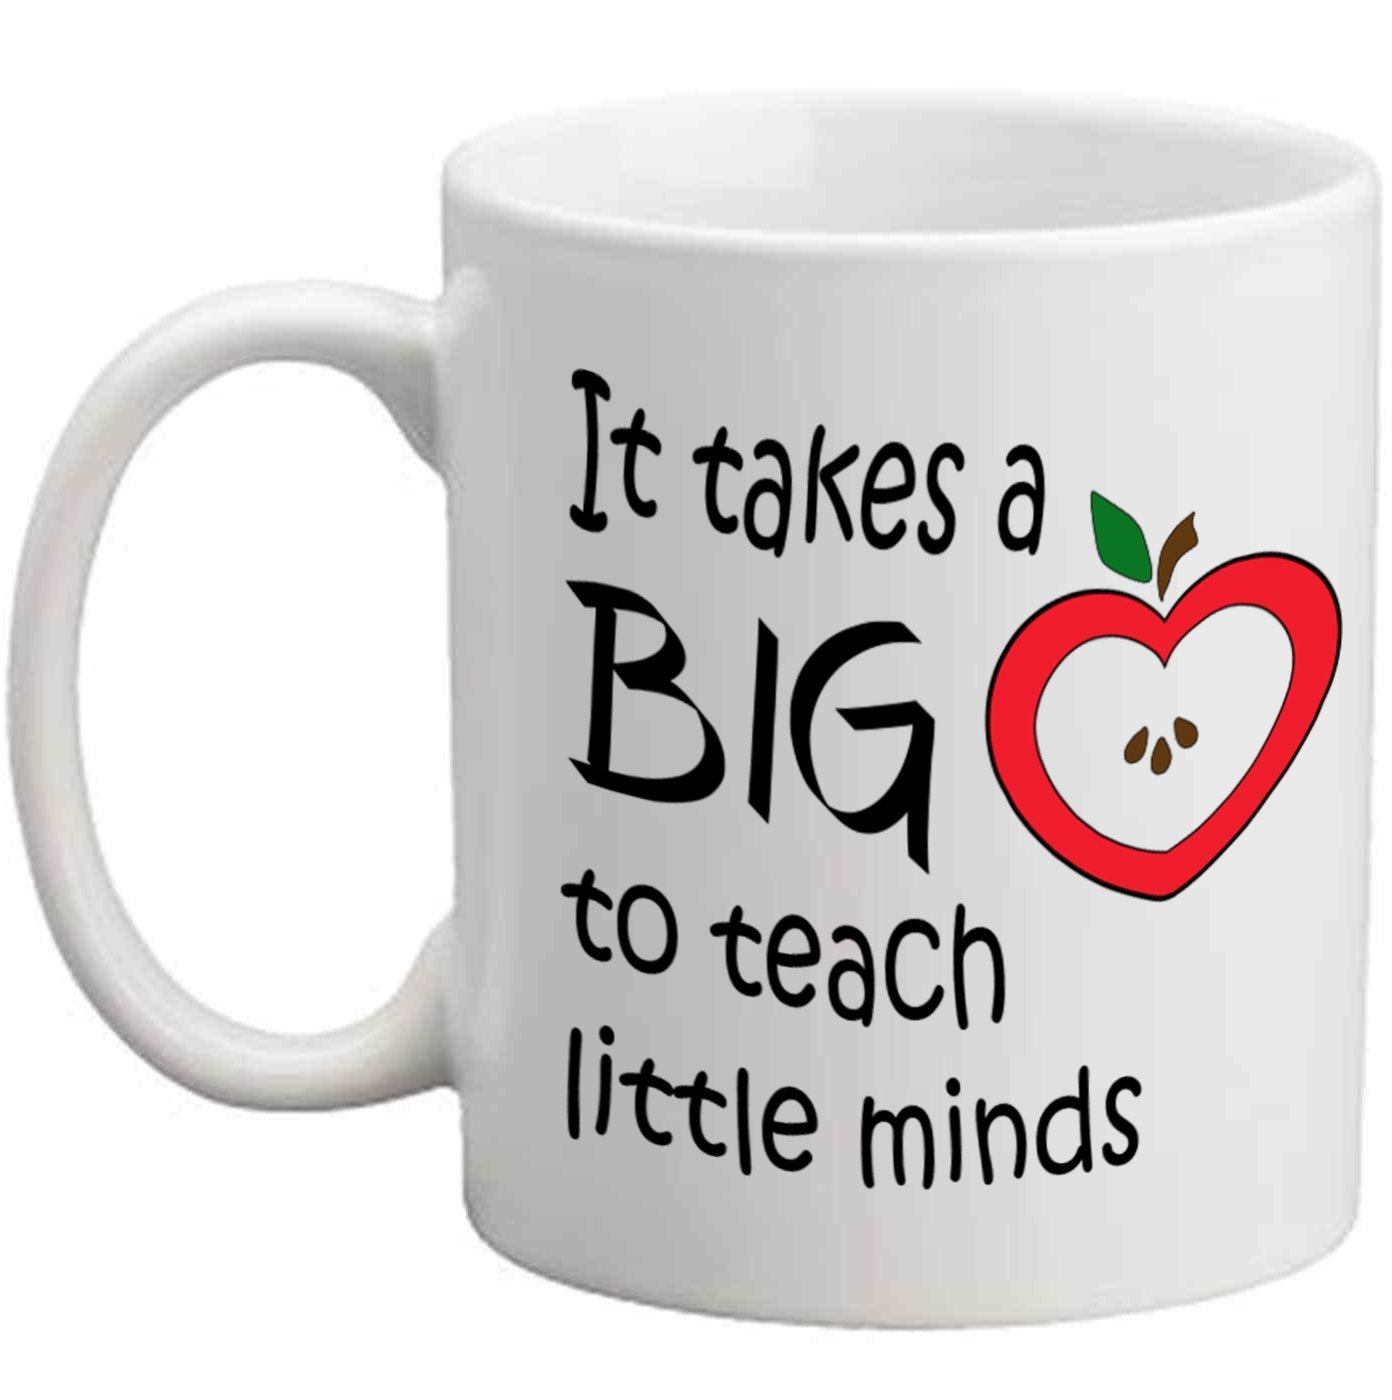 Teacher Gift Home School It Takes a Big Heart to Teach Little Minds